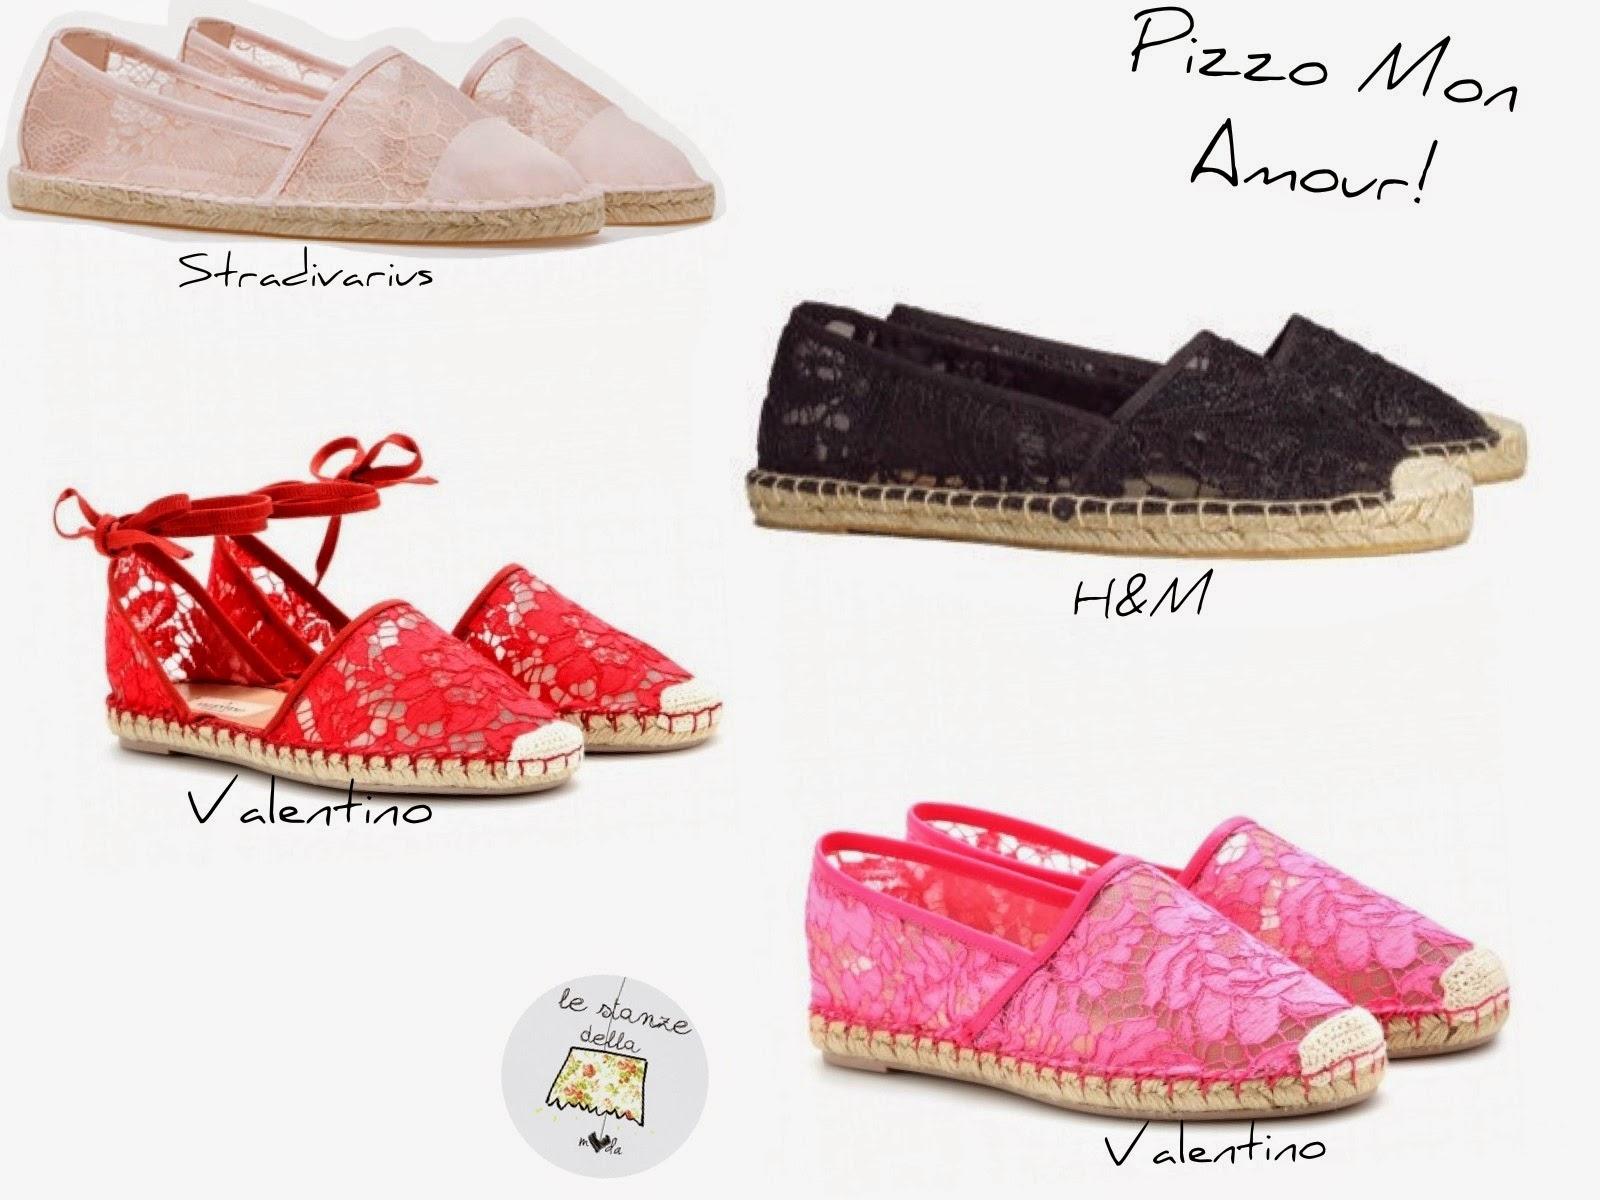 espadrillas, estate 2014, scarpe 2014 estate, scarpe e scarpe